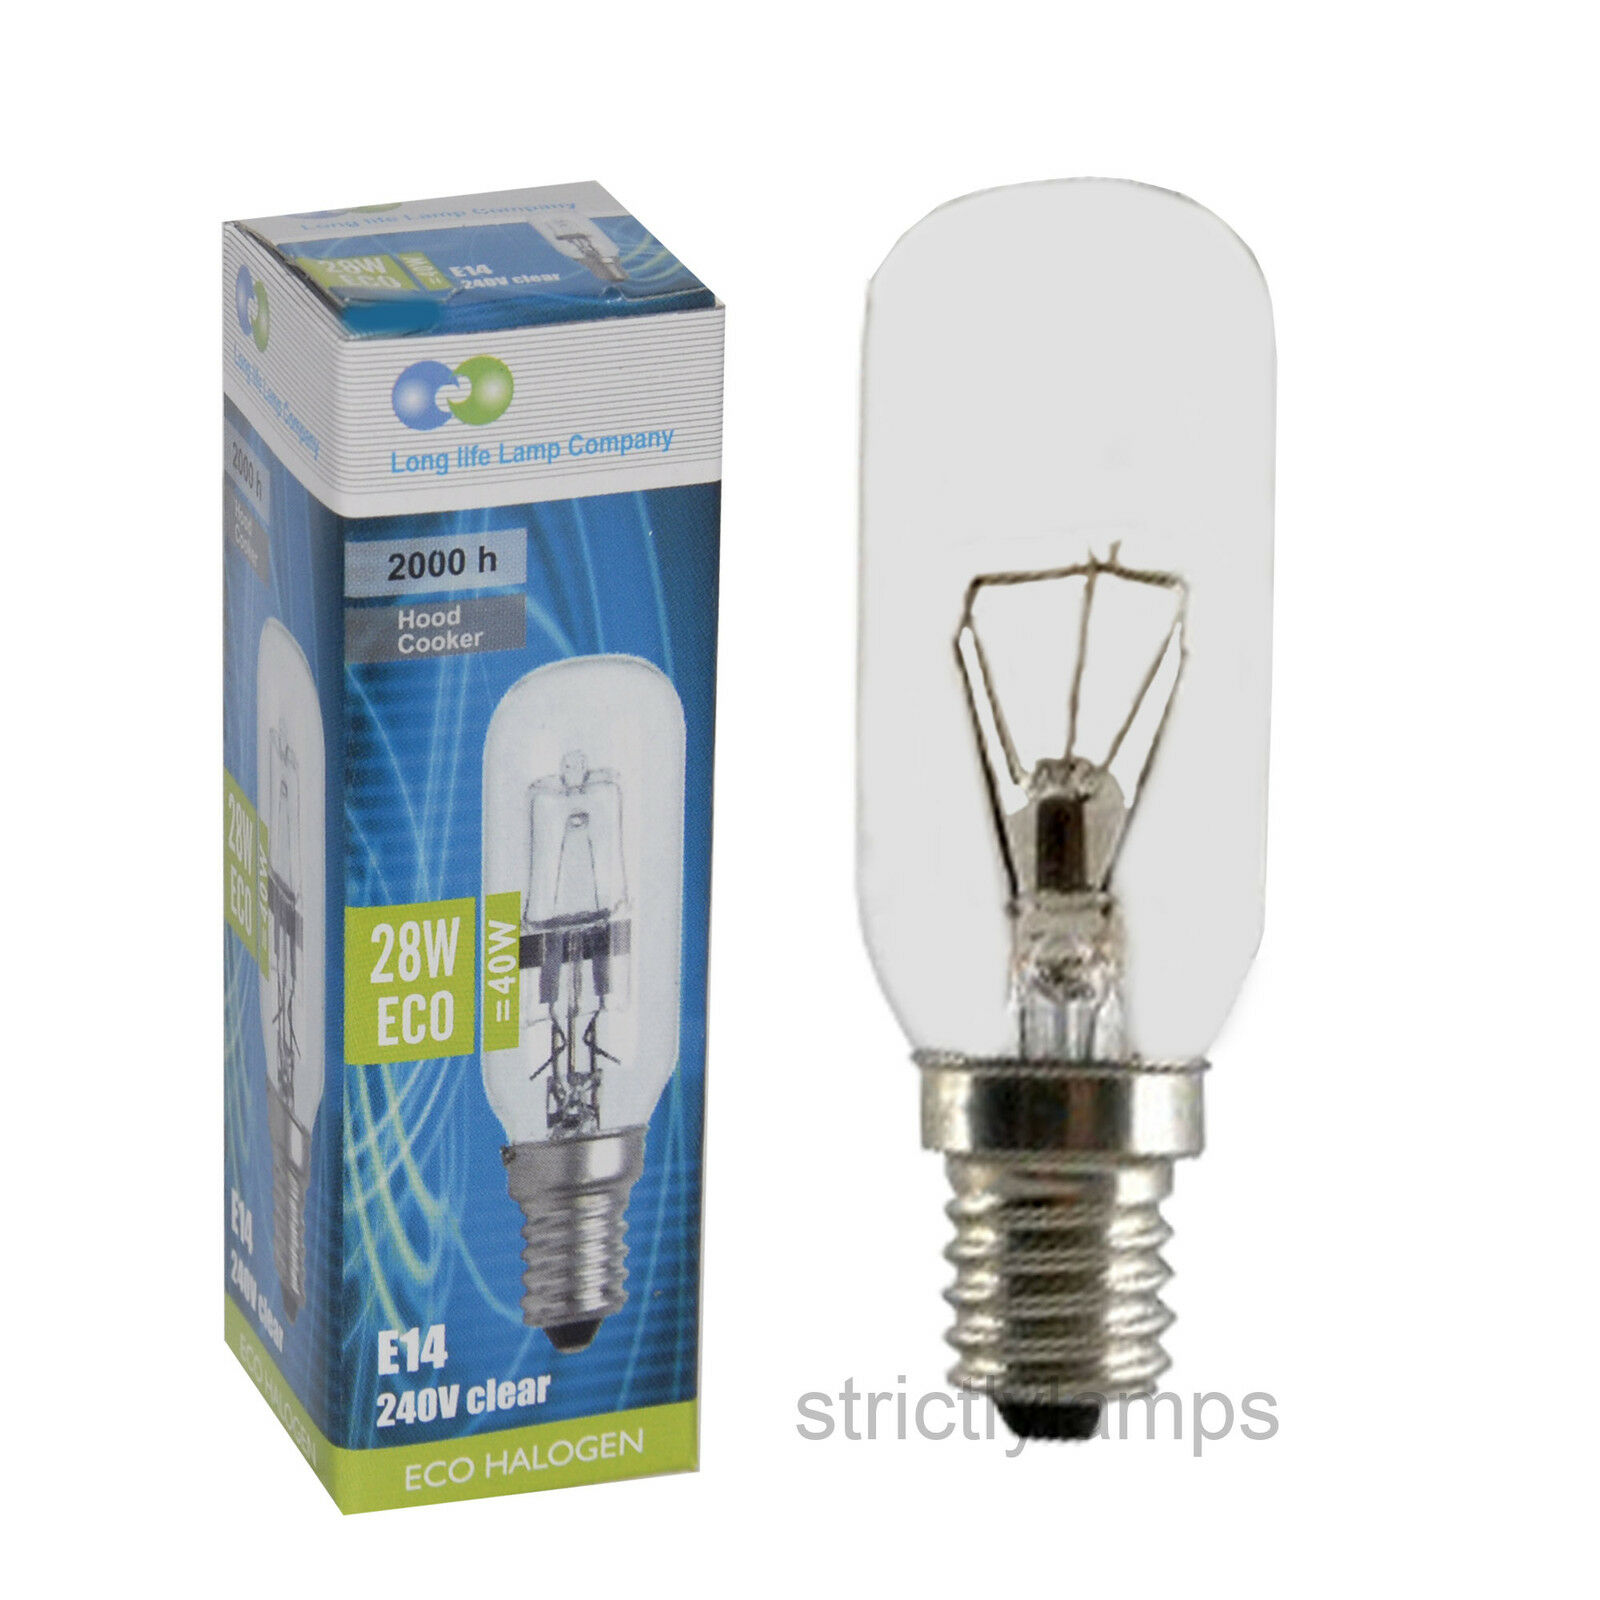 2 X 28w 40w Energy Saving Cooker Hood Bulbs Eco Halogen Bulbs Long Life New Ebay